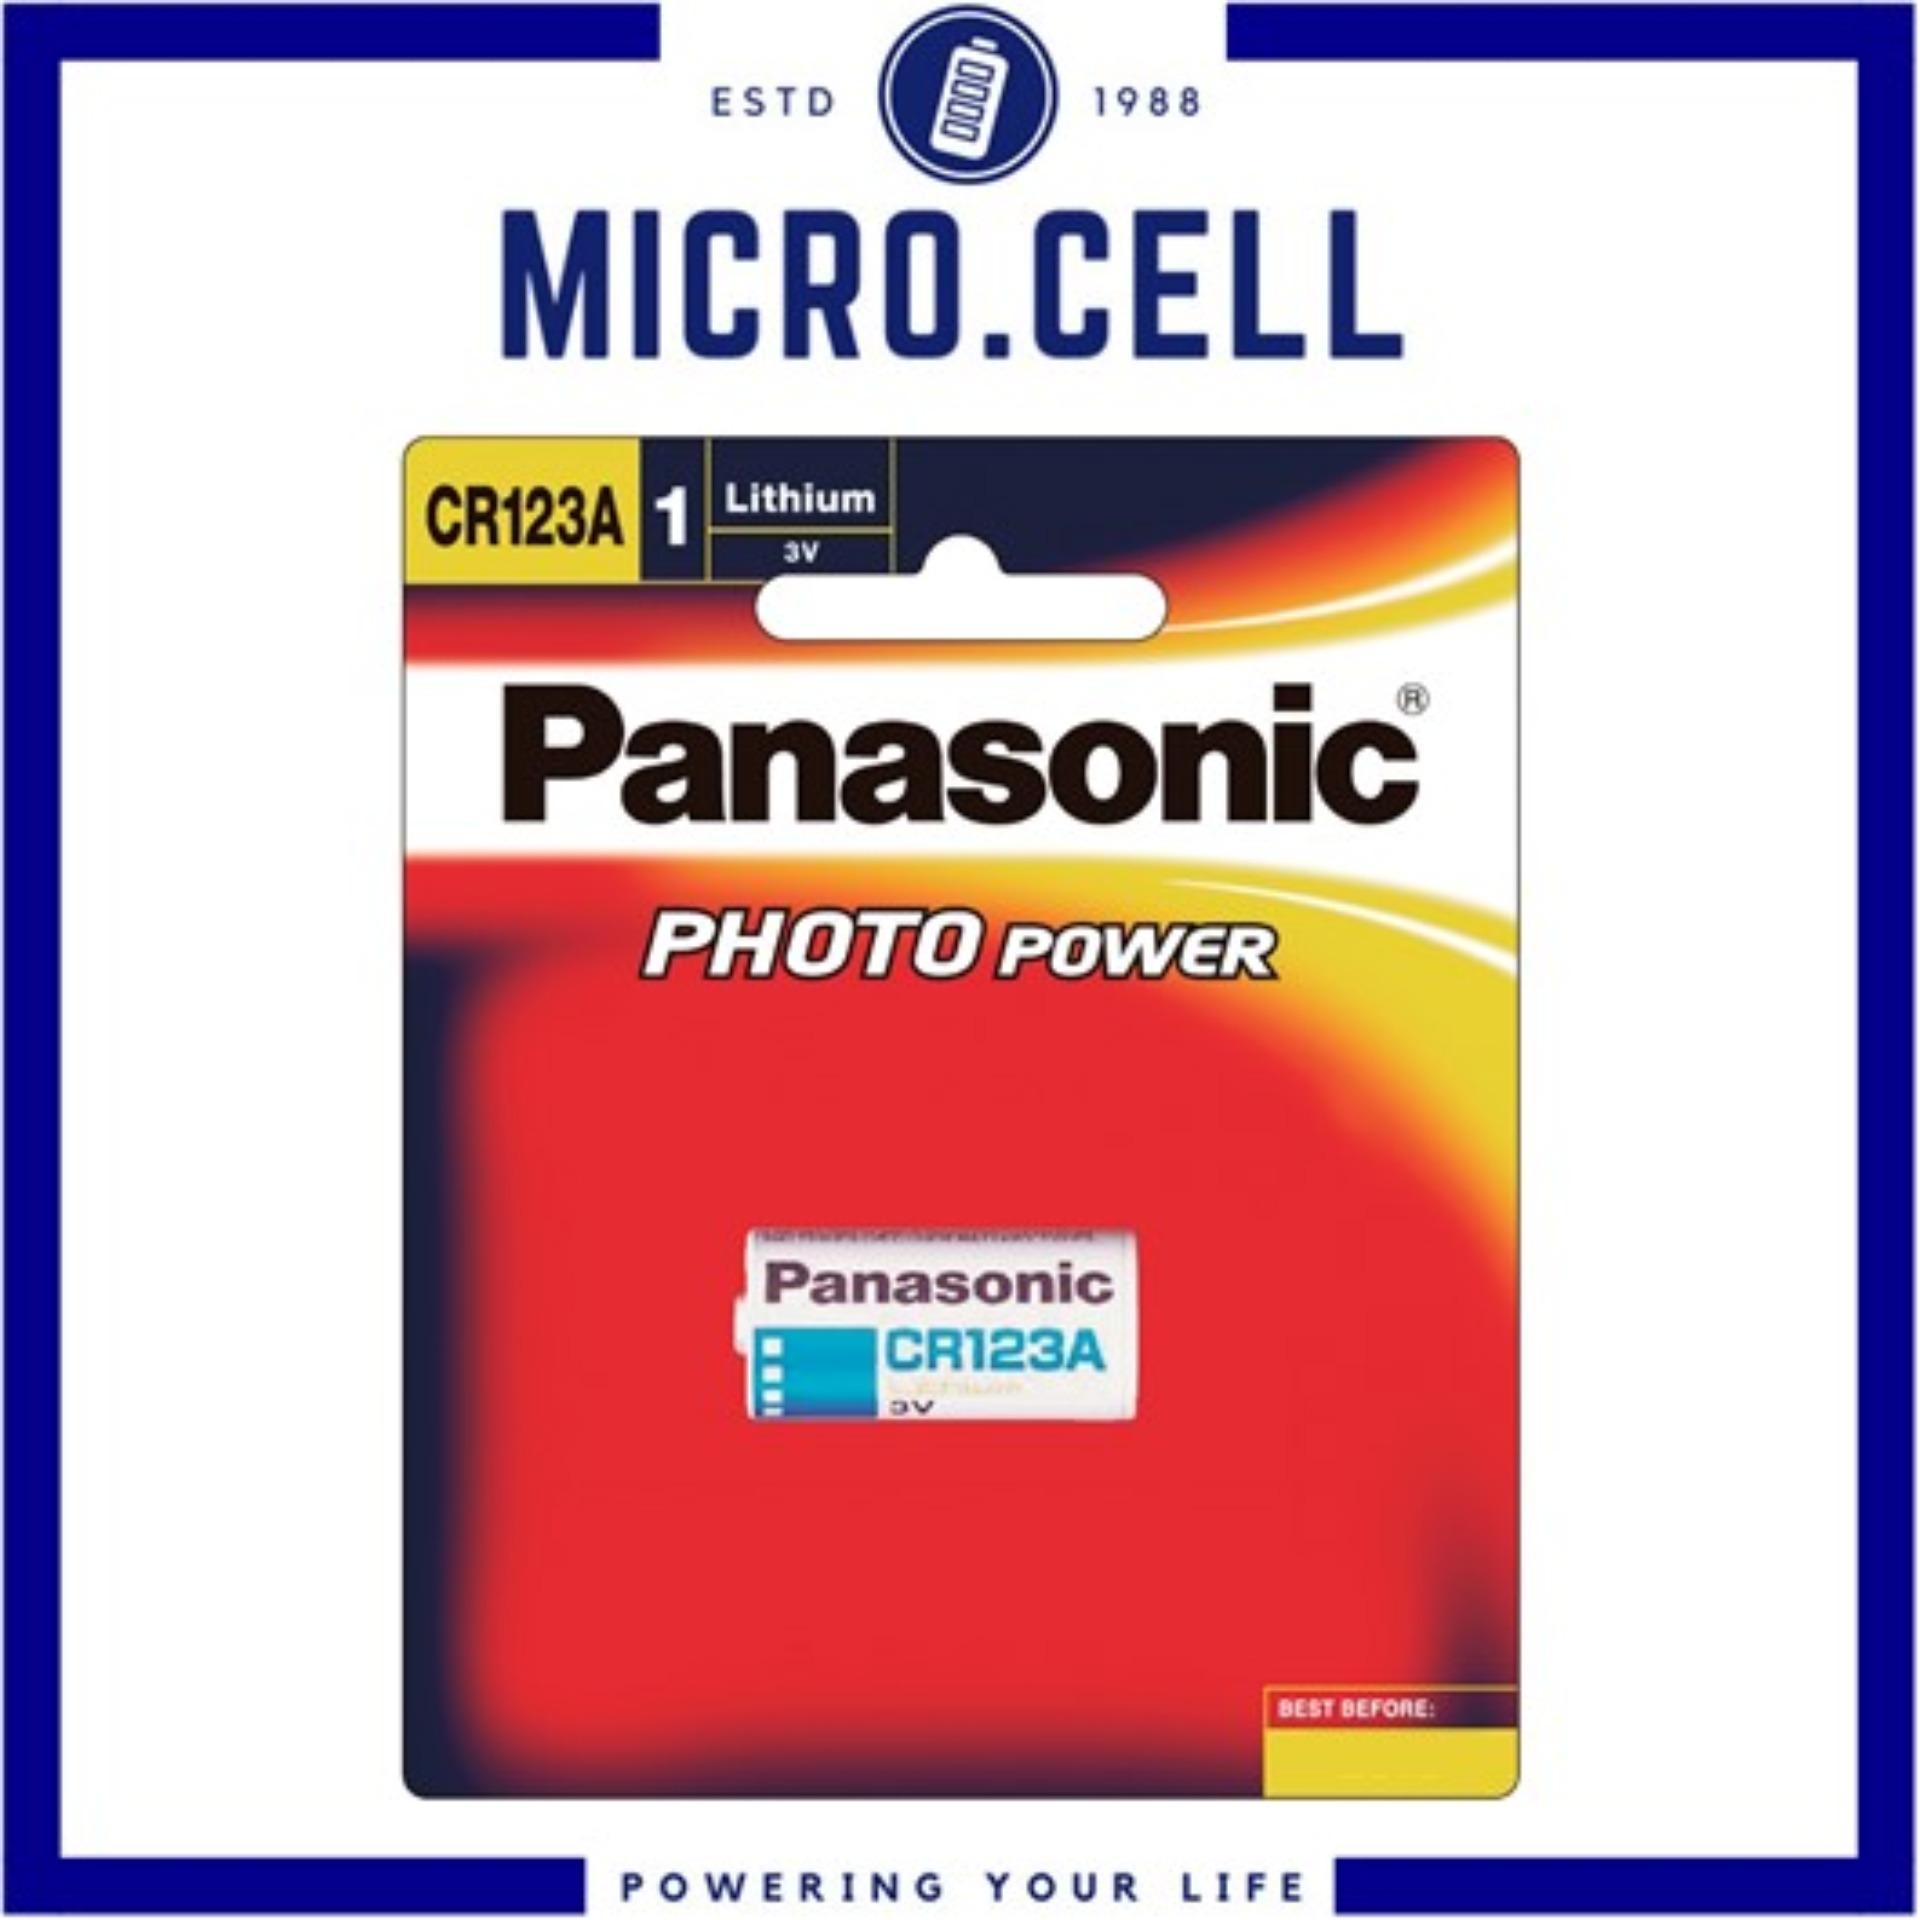 Panasonic CR123A Photo Lithium 3V CR123 Battery